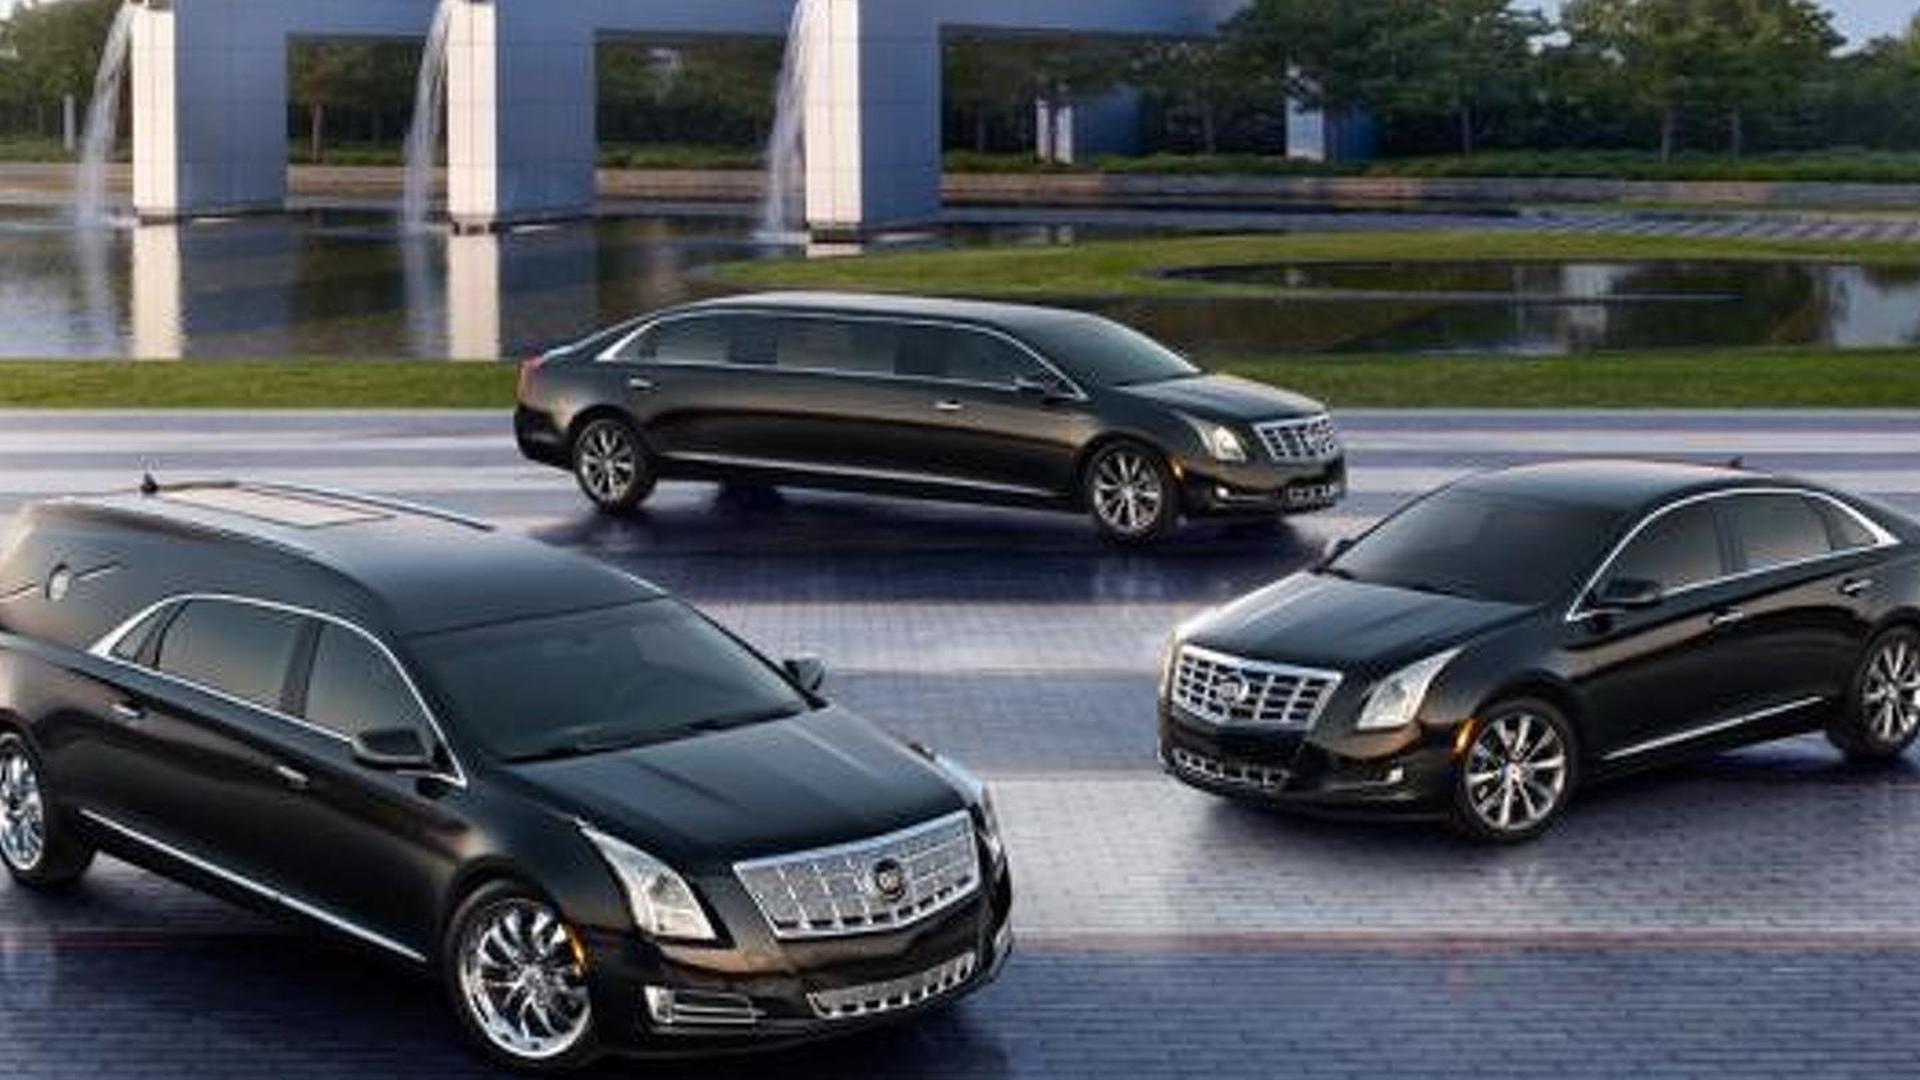 Cadillac XTS Limo & Hearse revealed